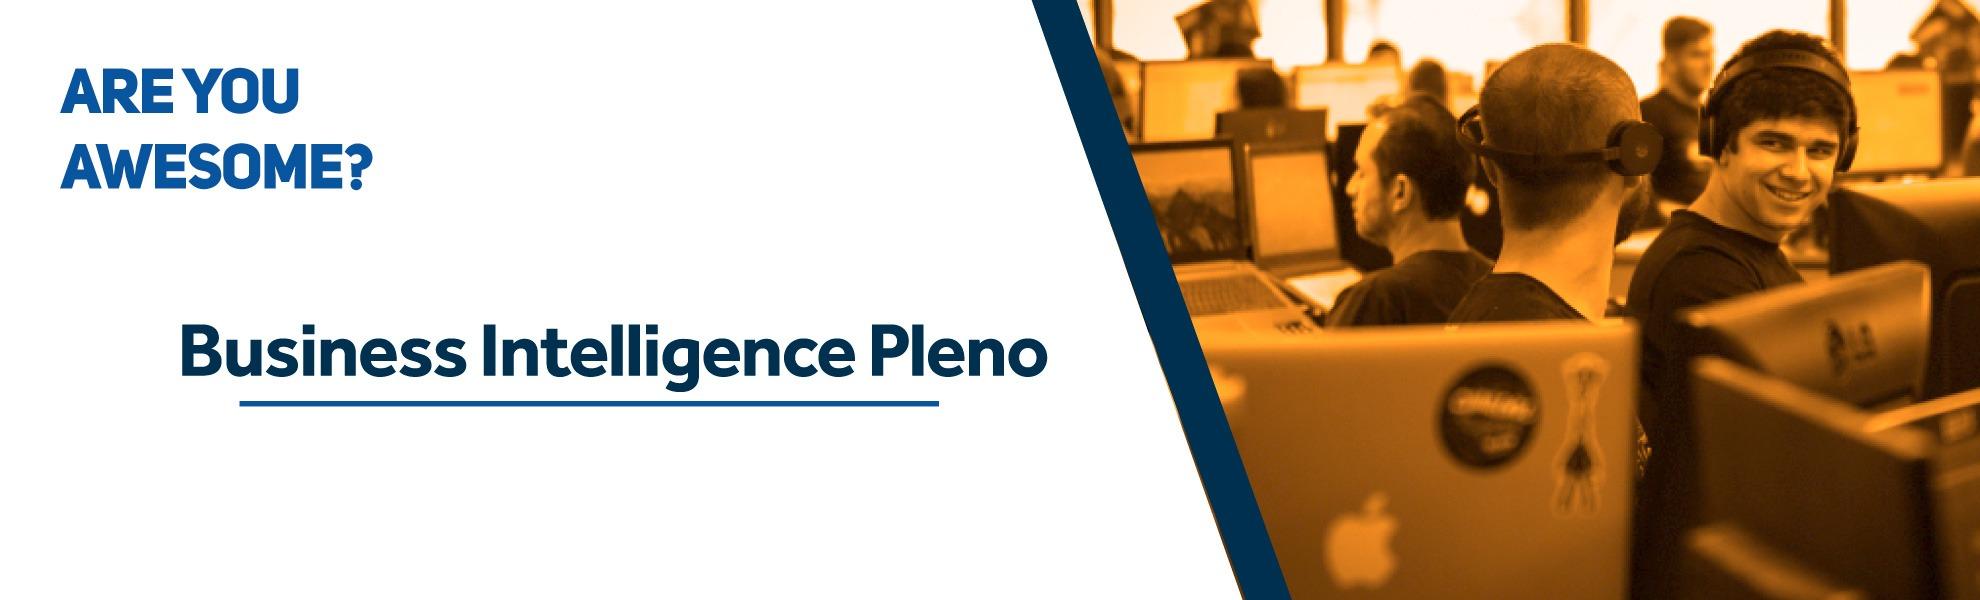 Analista de Business Intelligence Pleno